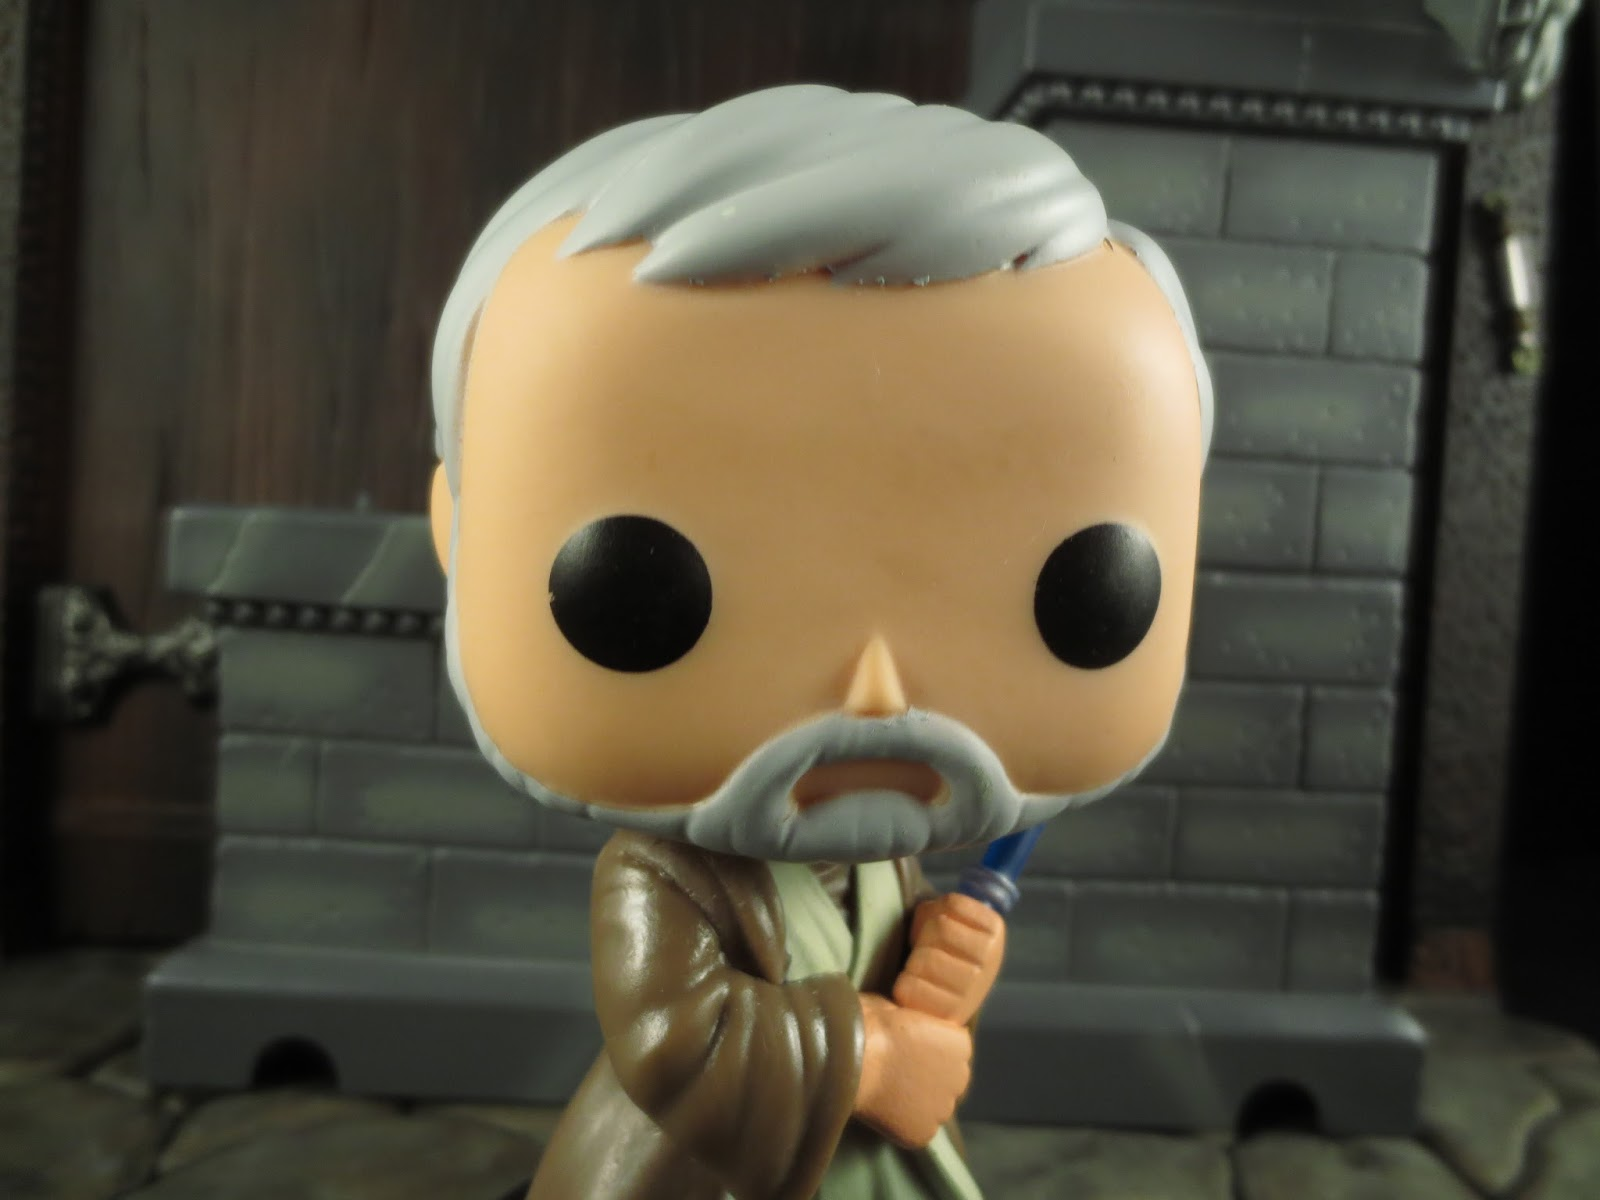 Star Wars Ben Kenobi Cantina Pop Vinyl Figure Smuggler S Bounty Exclusive Funko Film Tv Videospiele Spielzeug